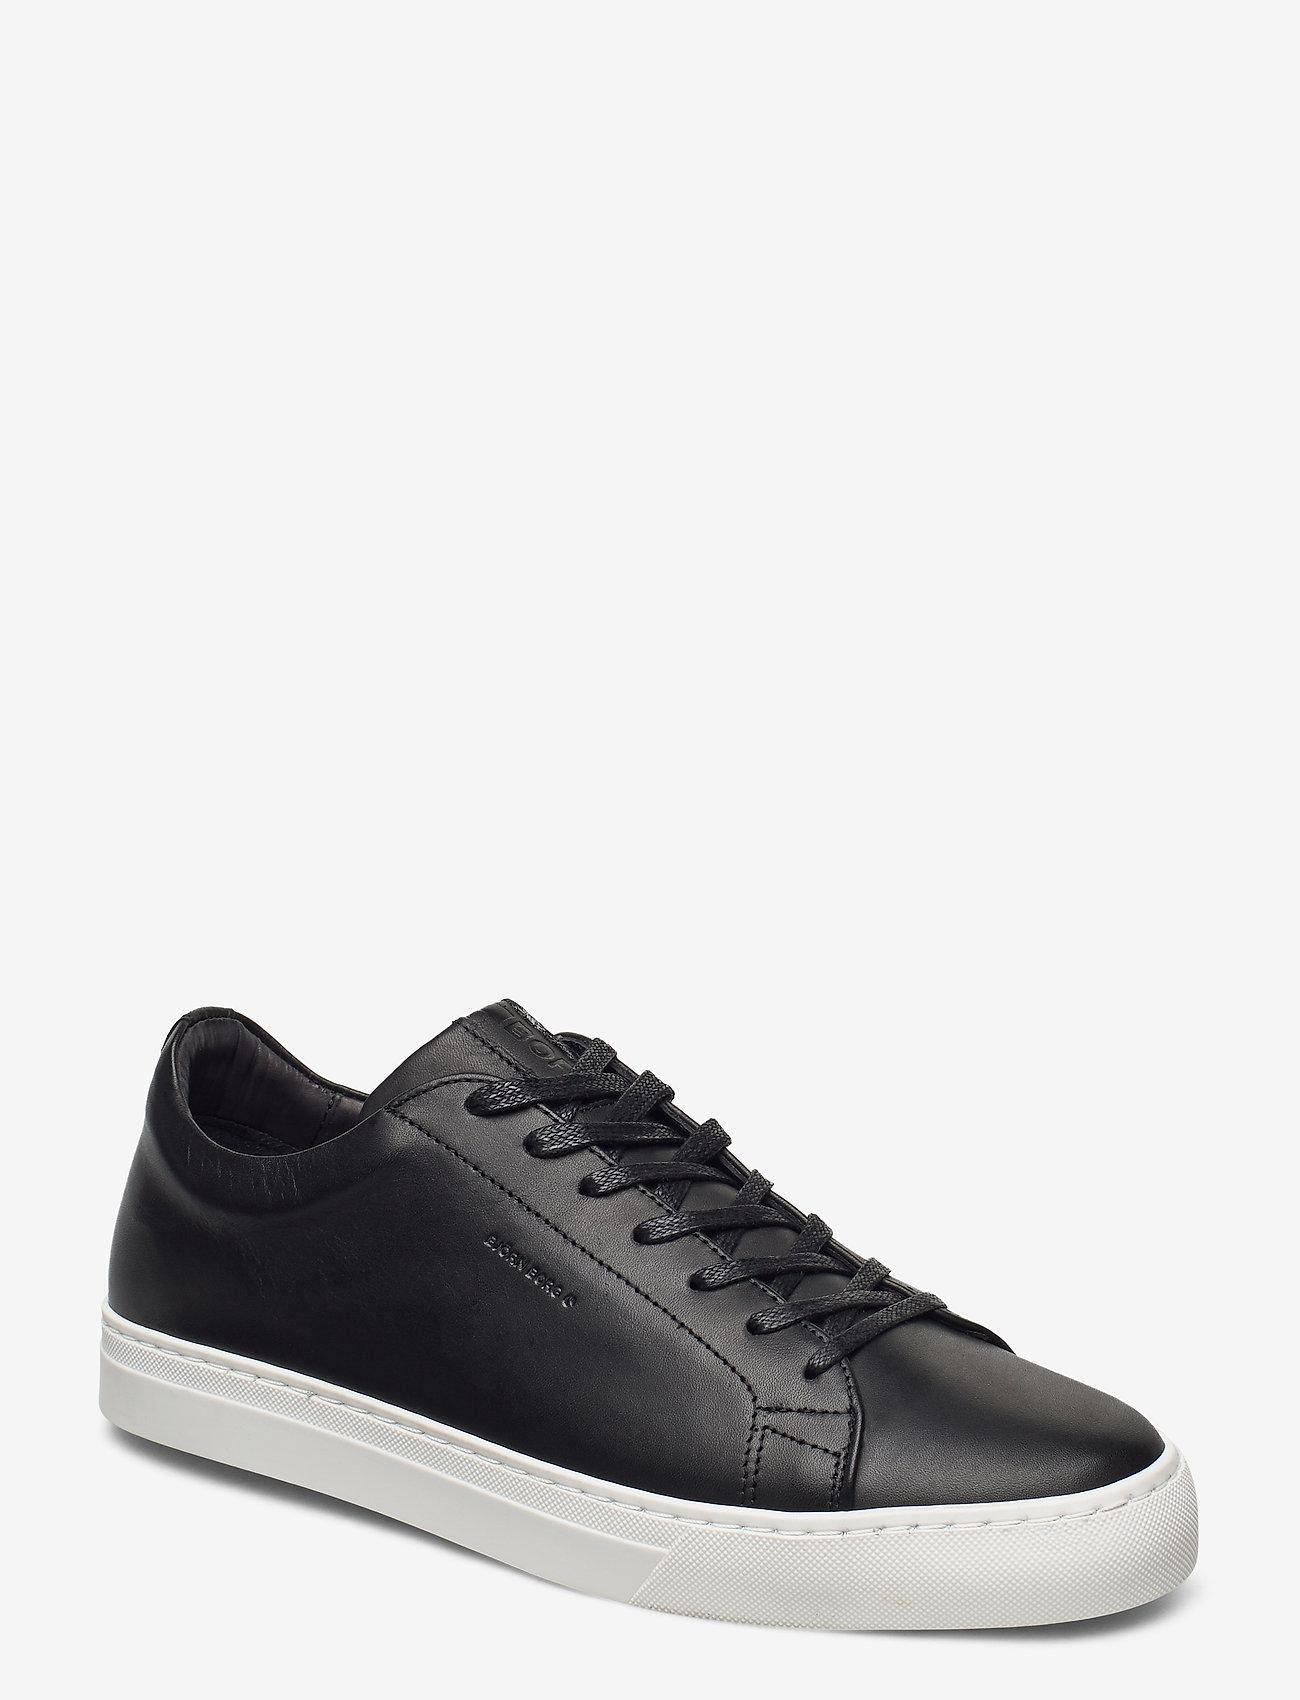 Björn Borg - JORDEN LEA M - laag sneakers - black - 0